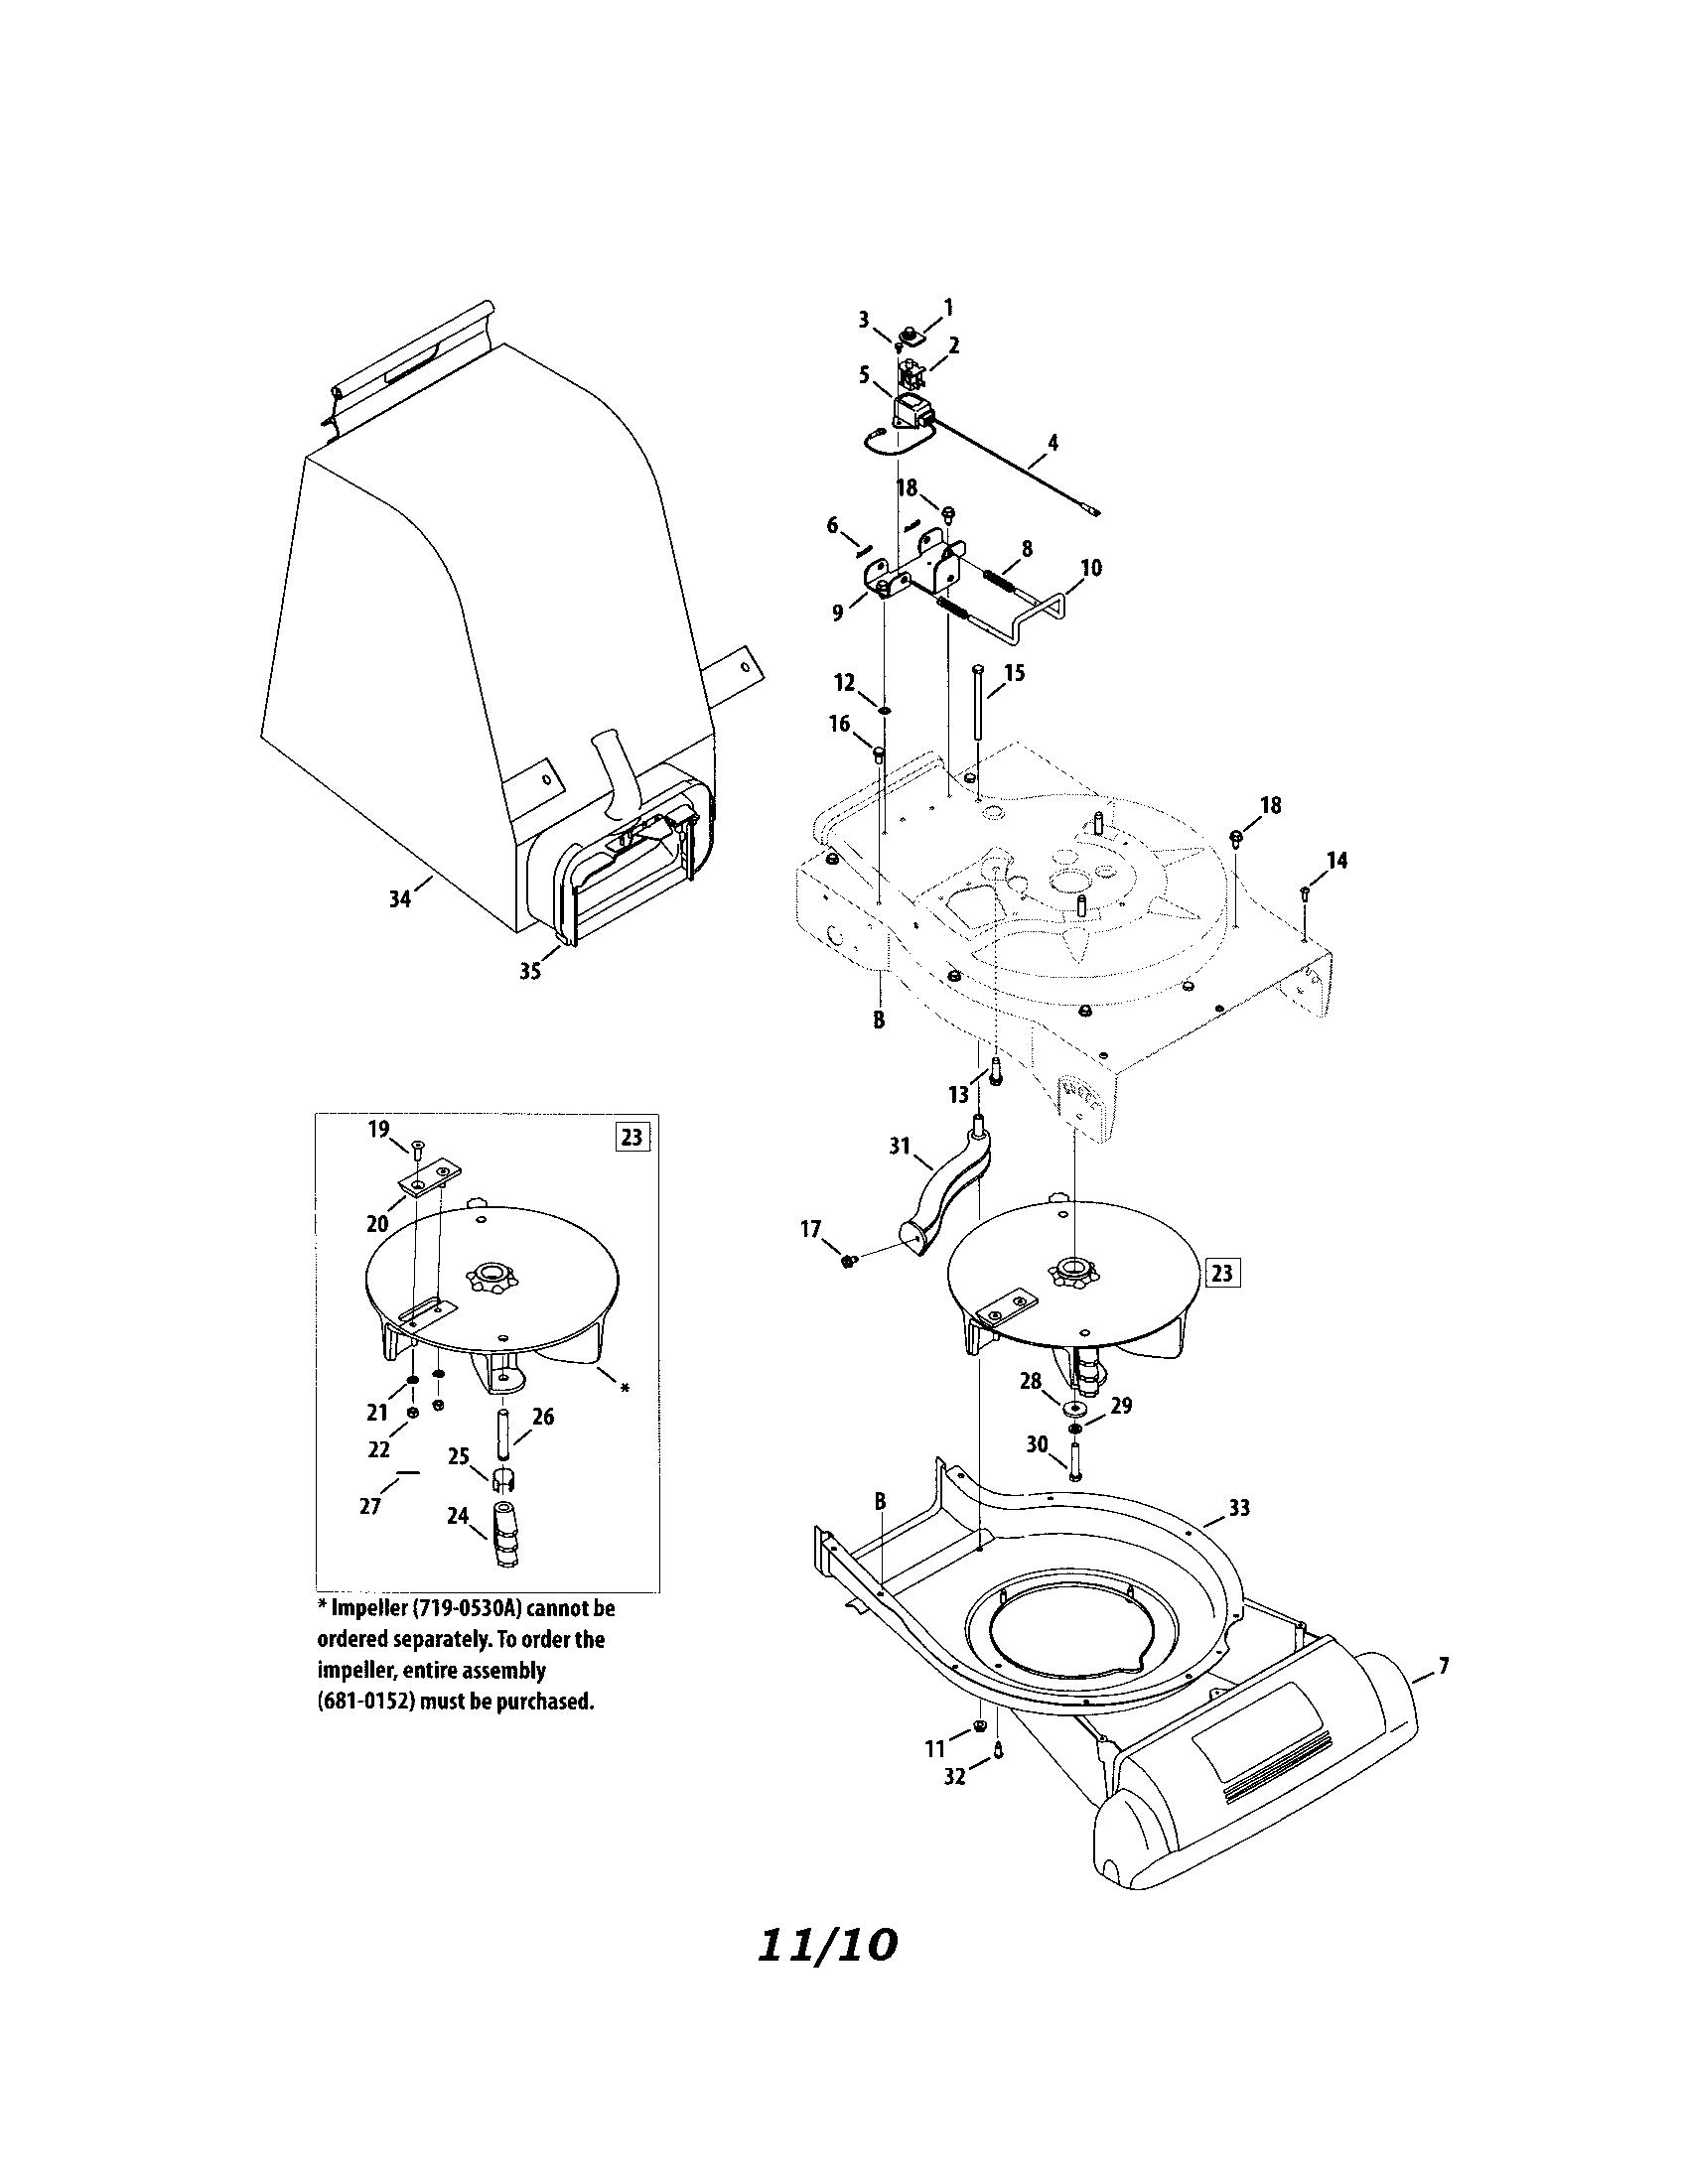 Craftsman model 24777243 chipper shredder/vacuum, gas